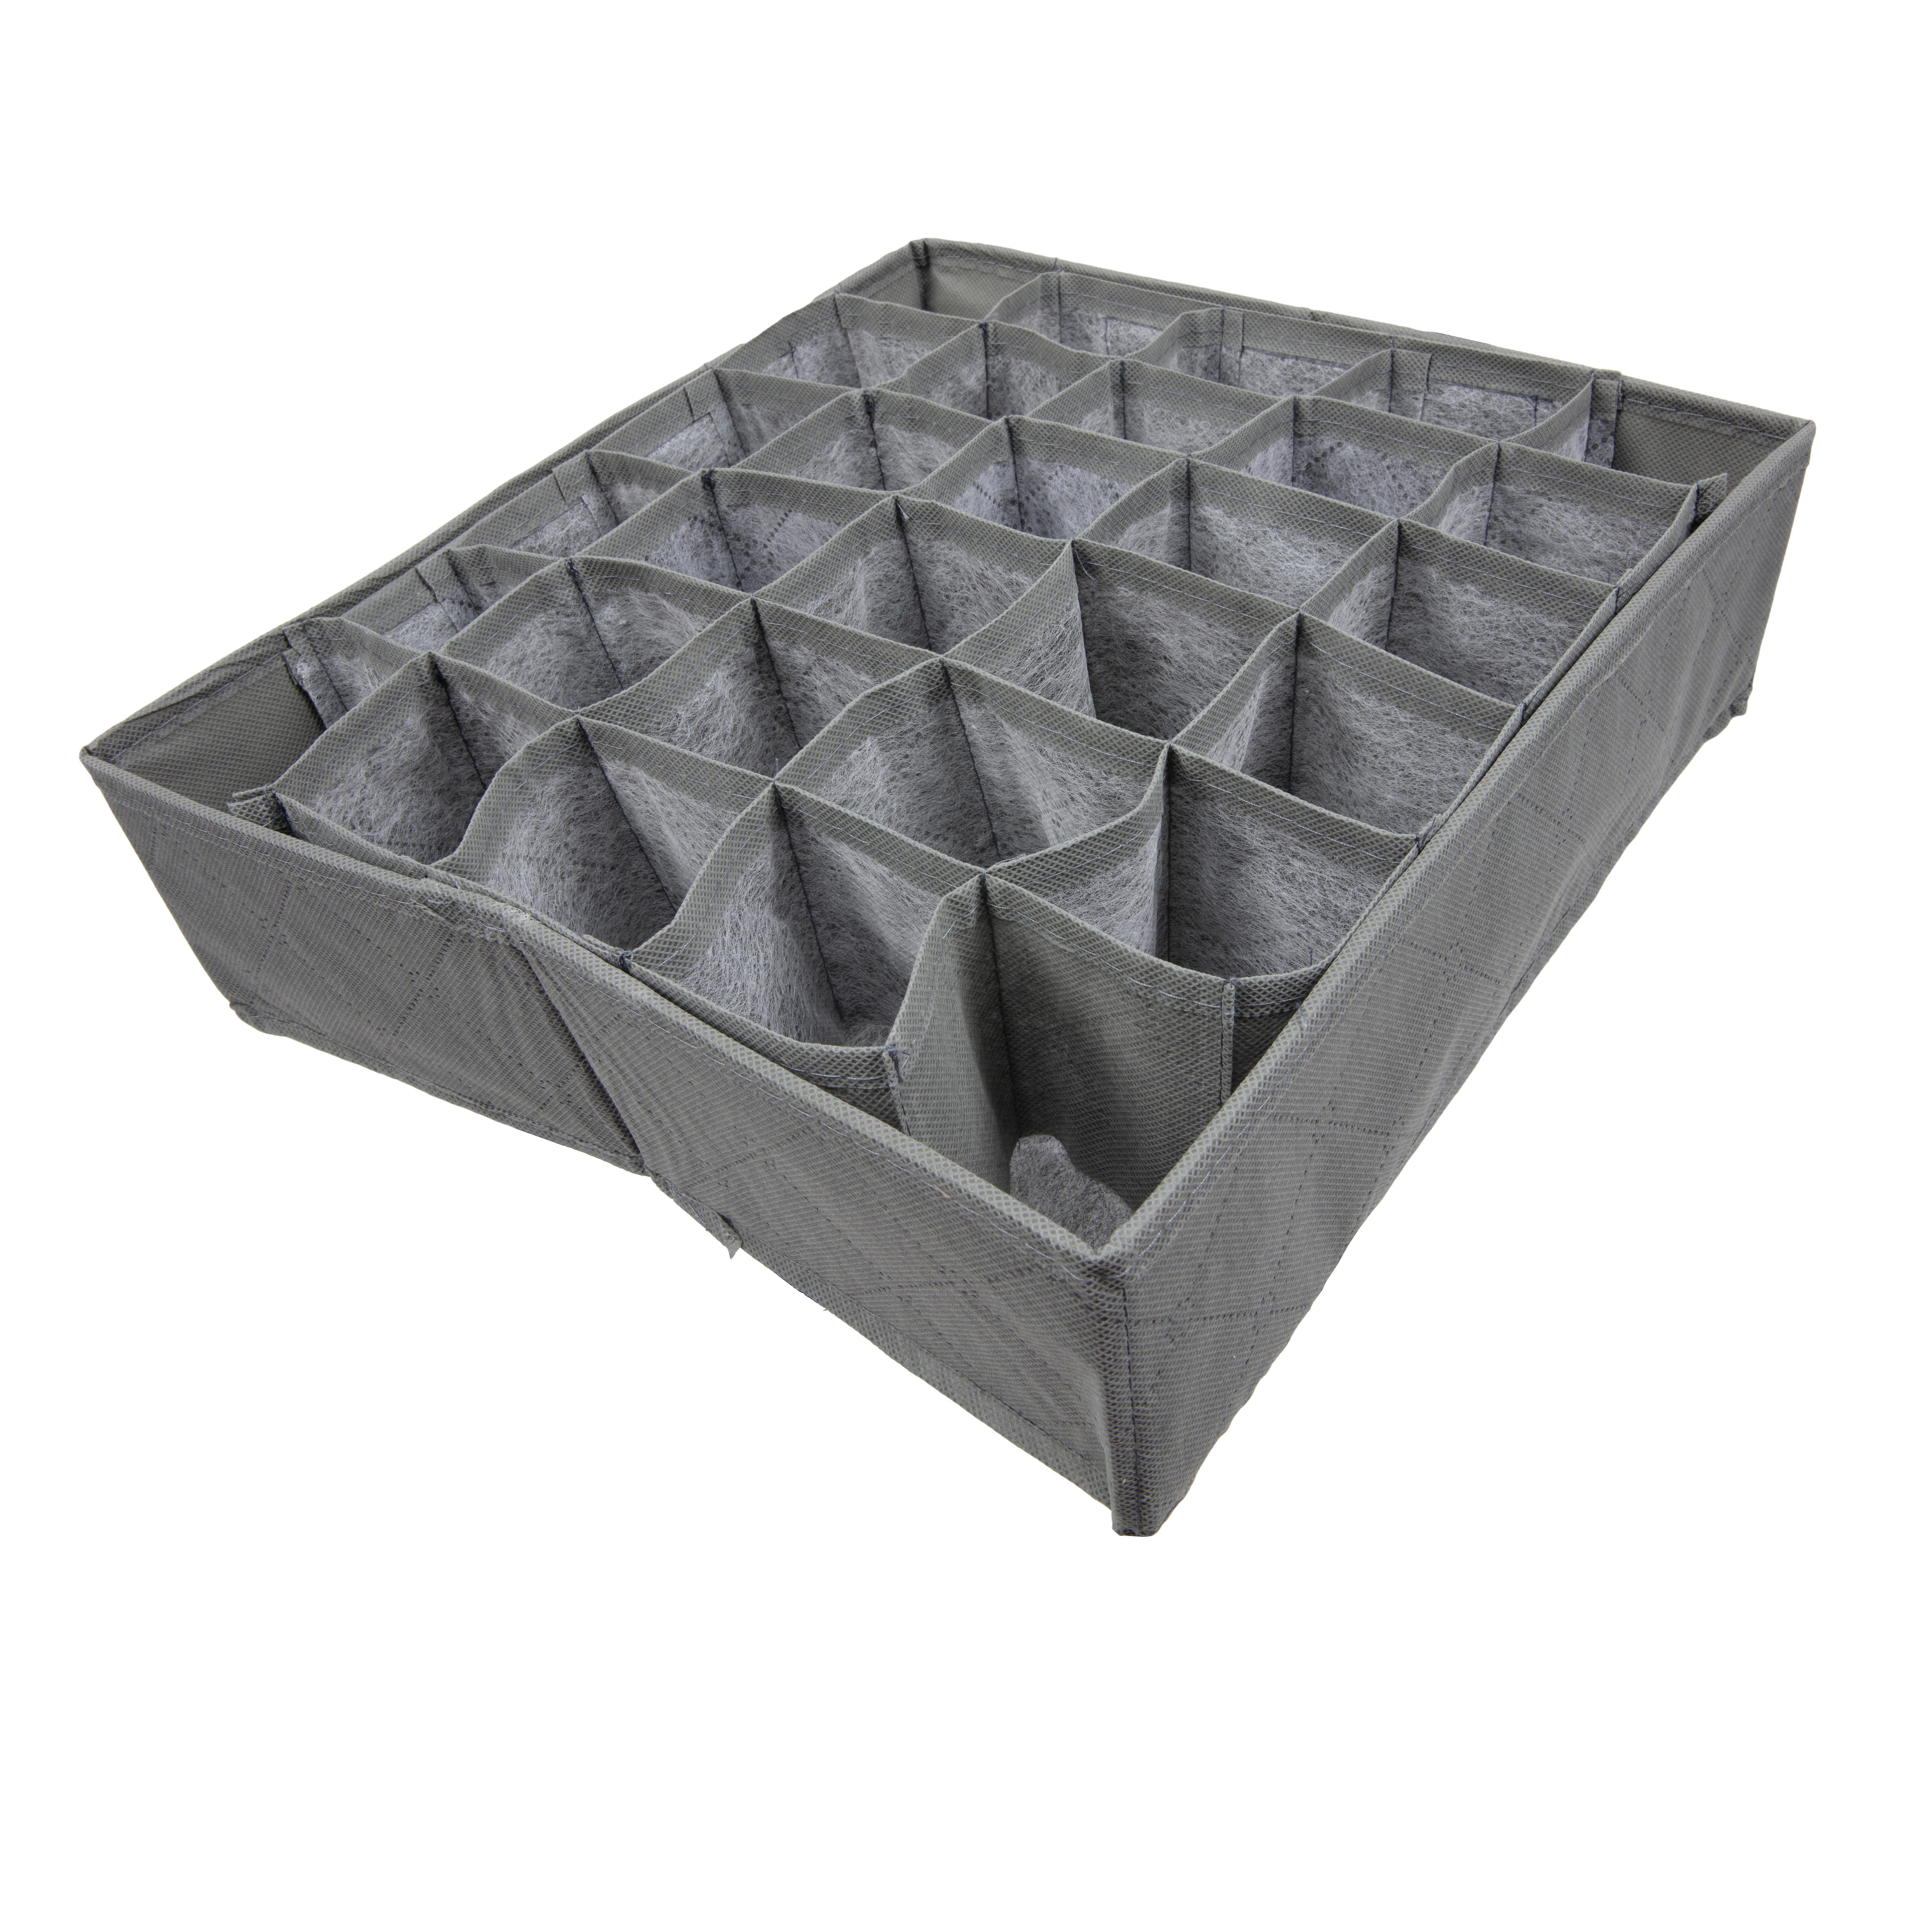 TRIXES Storage Box For Socks Ties Underwear Drawer Wardrobe Organiser Container